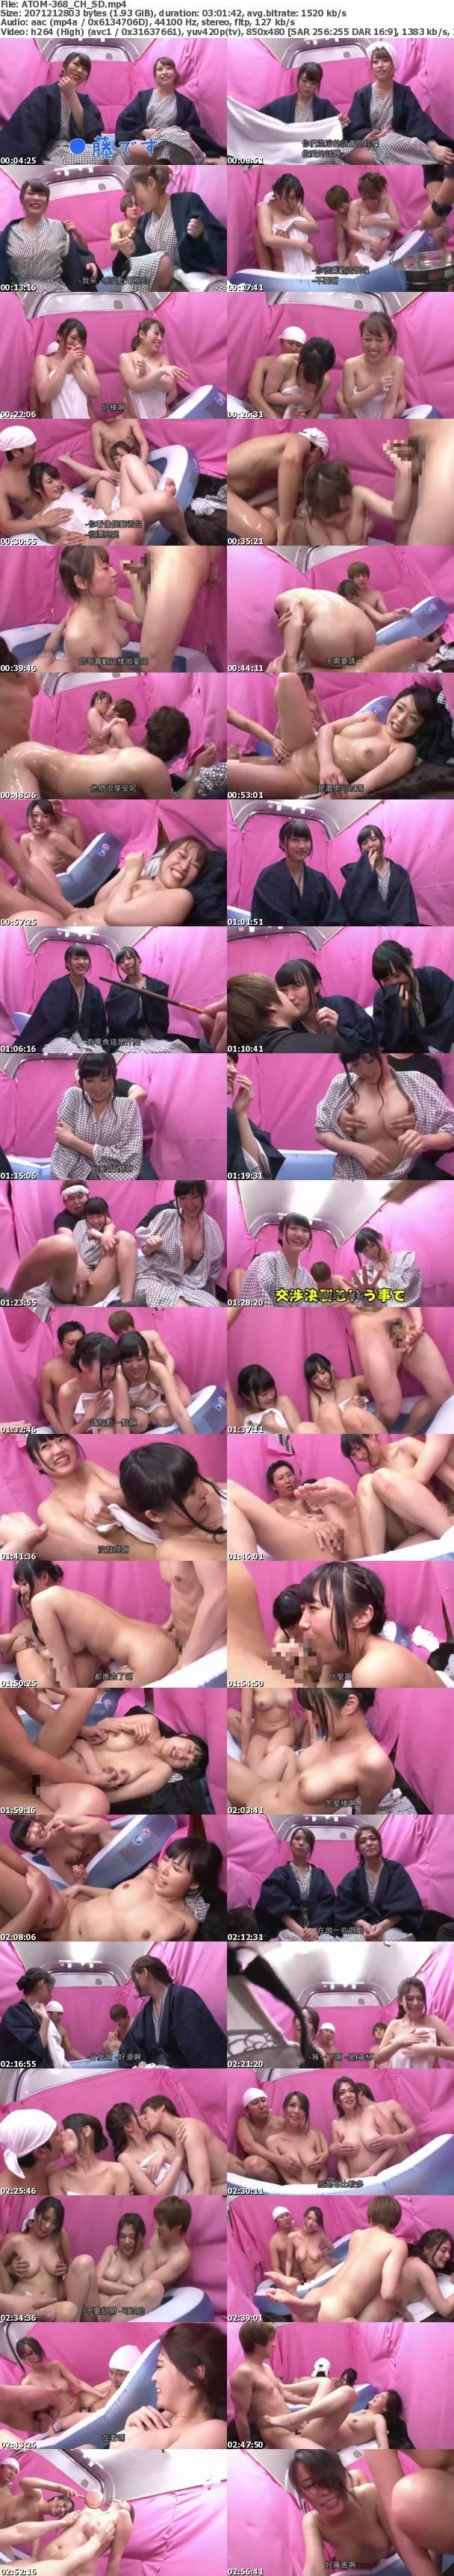 ATOM-368 在溫泉街看到的浴衣美女!要不要裹上浴巾參加潤滑混浴試試看?[中文字幕]